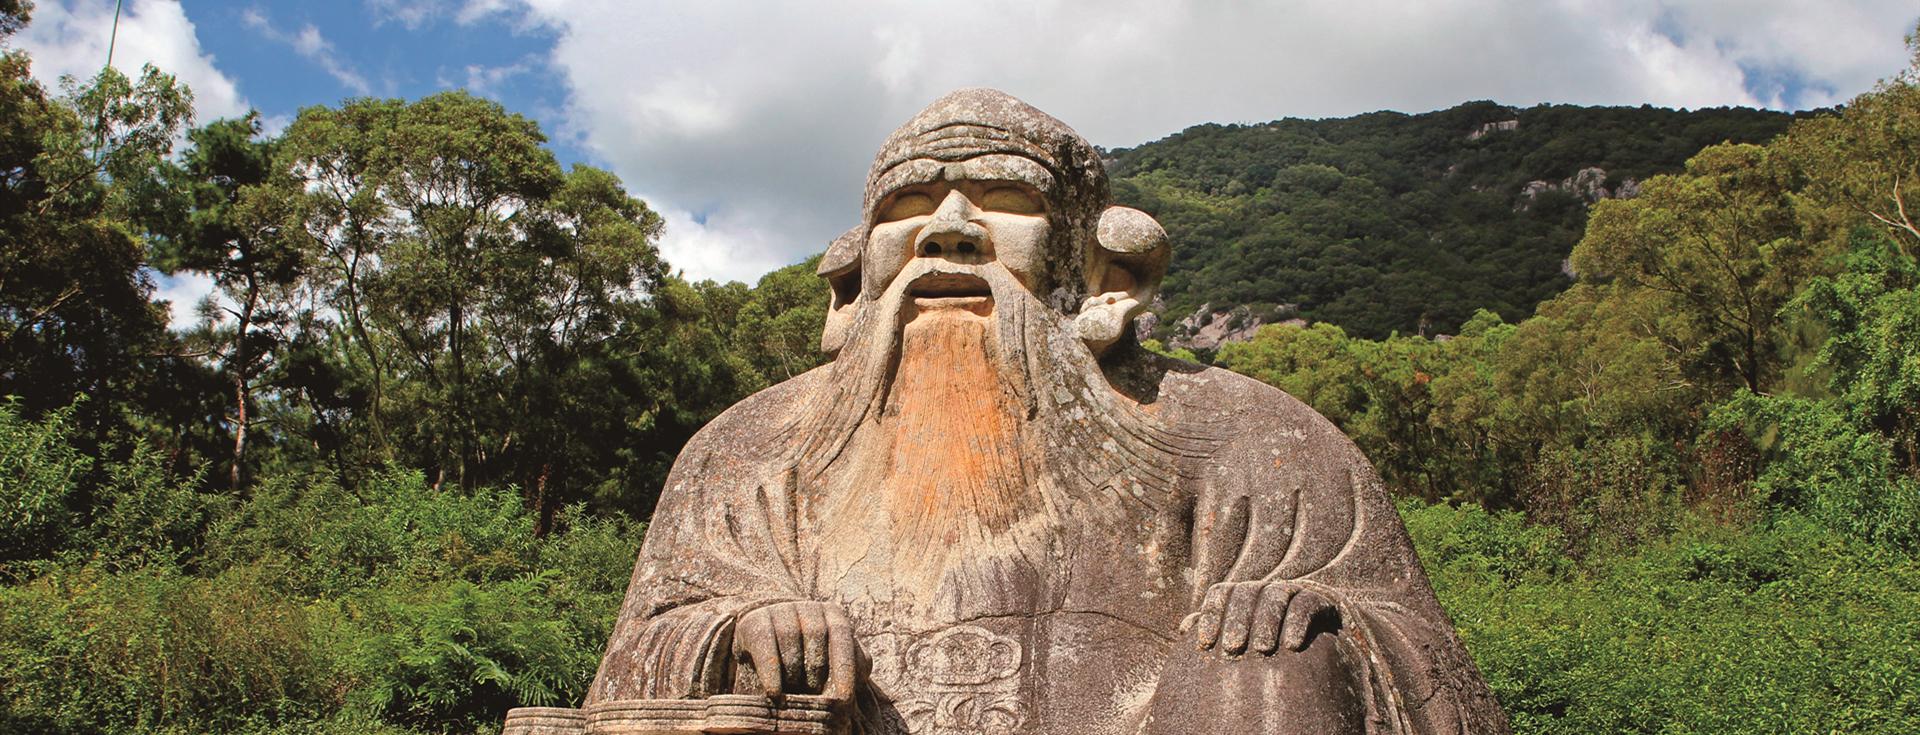 Mount Qingyuan Scenic Spot